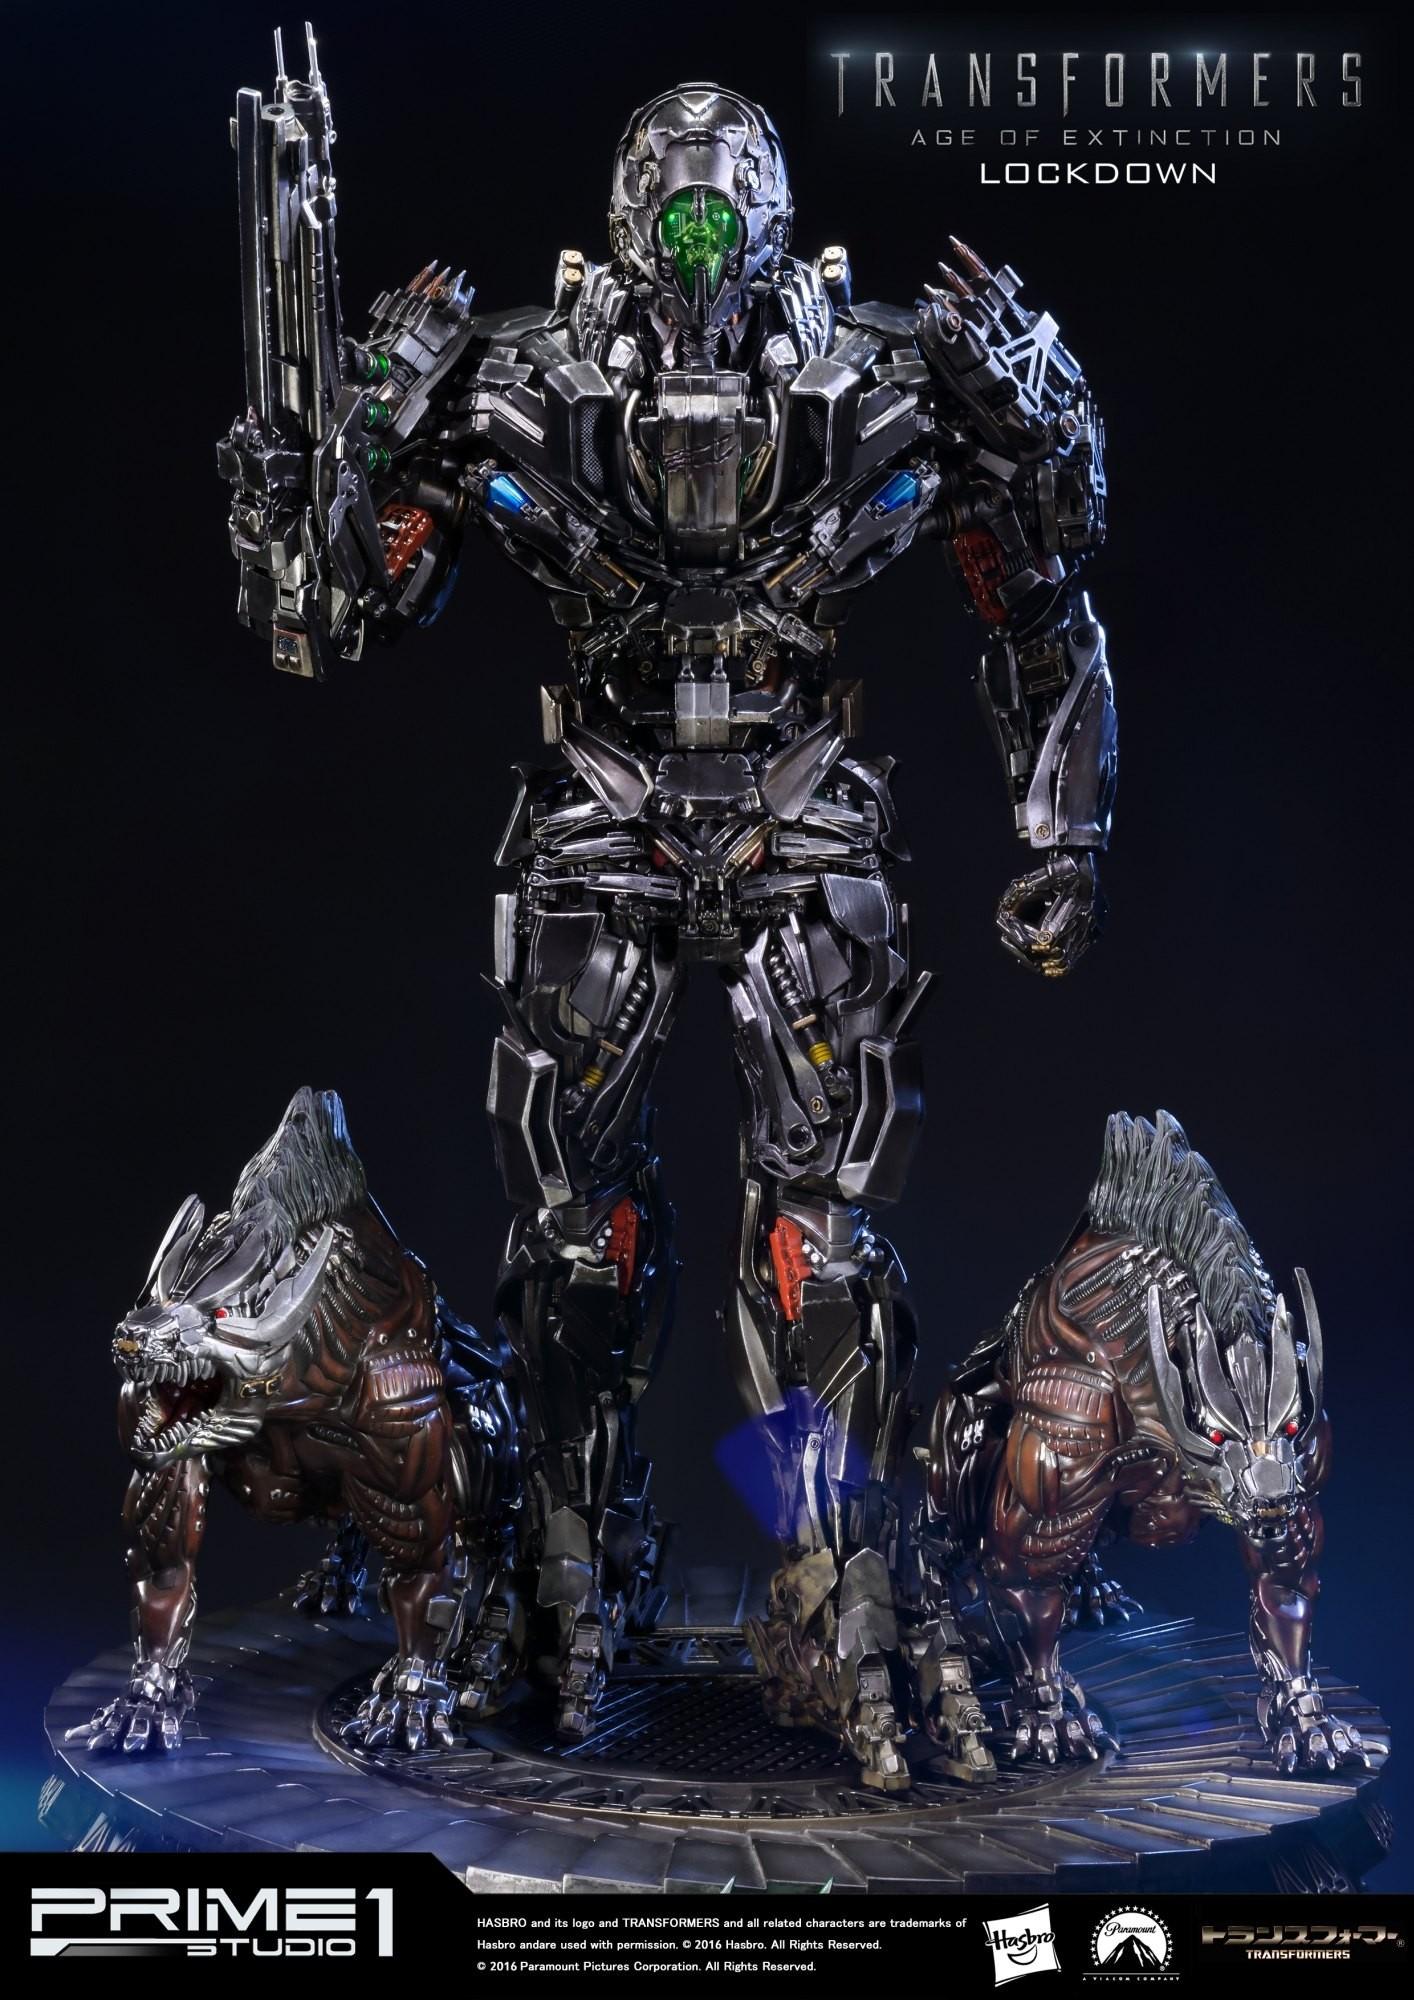 Lockdown Transformers